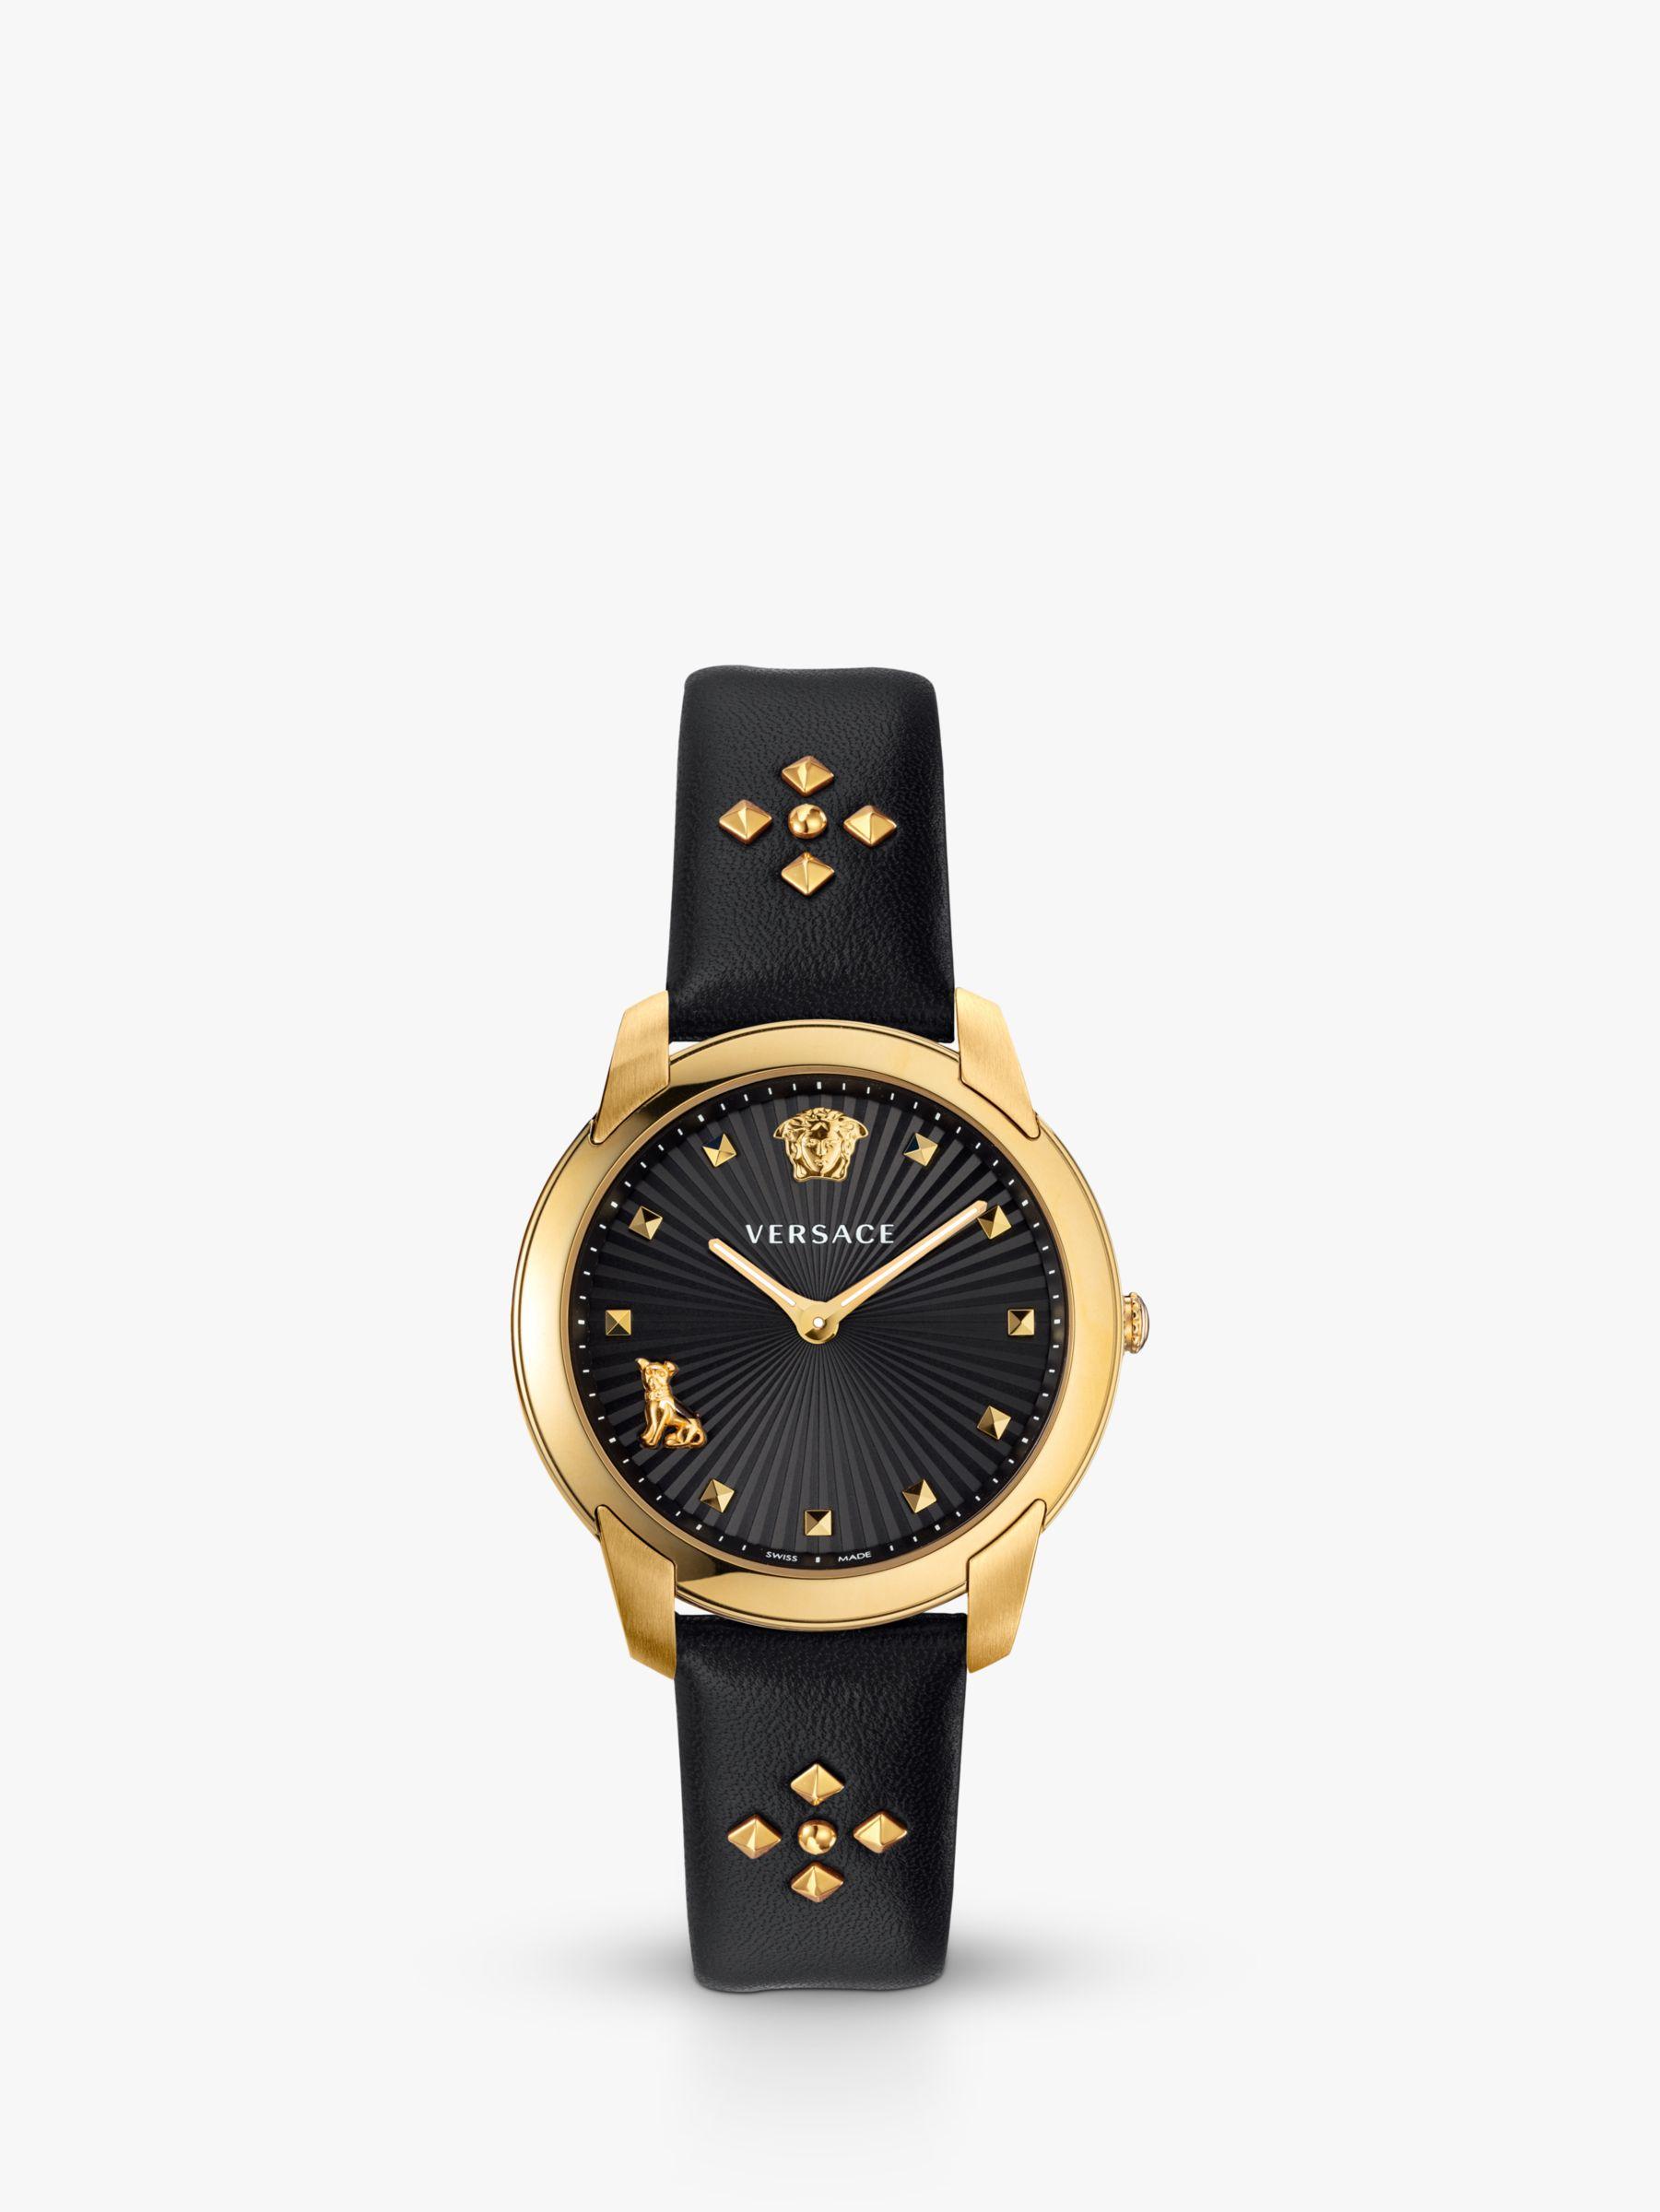 Versace Versace VELR00319 Women's Audrey Stud Detail Leather Strap Watch, Black/Gold